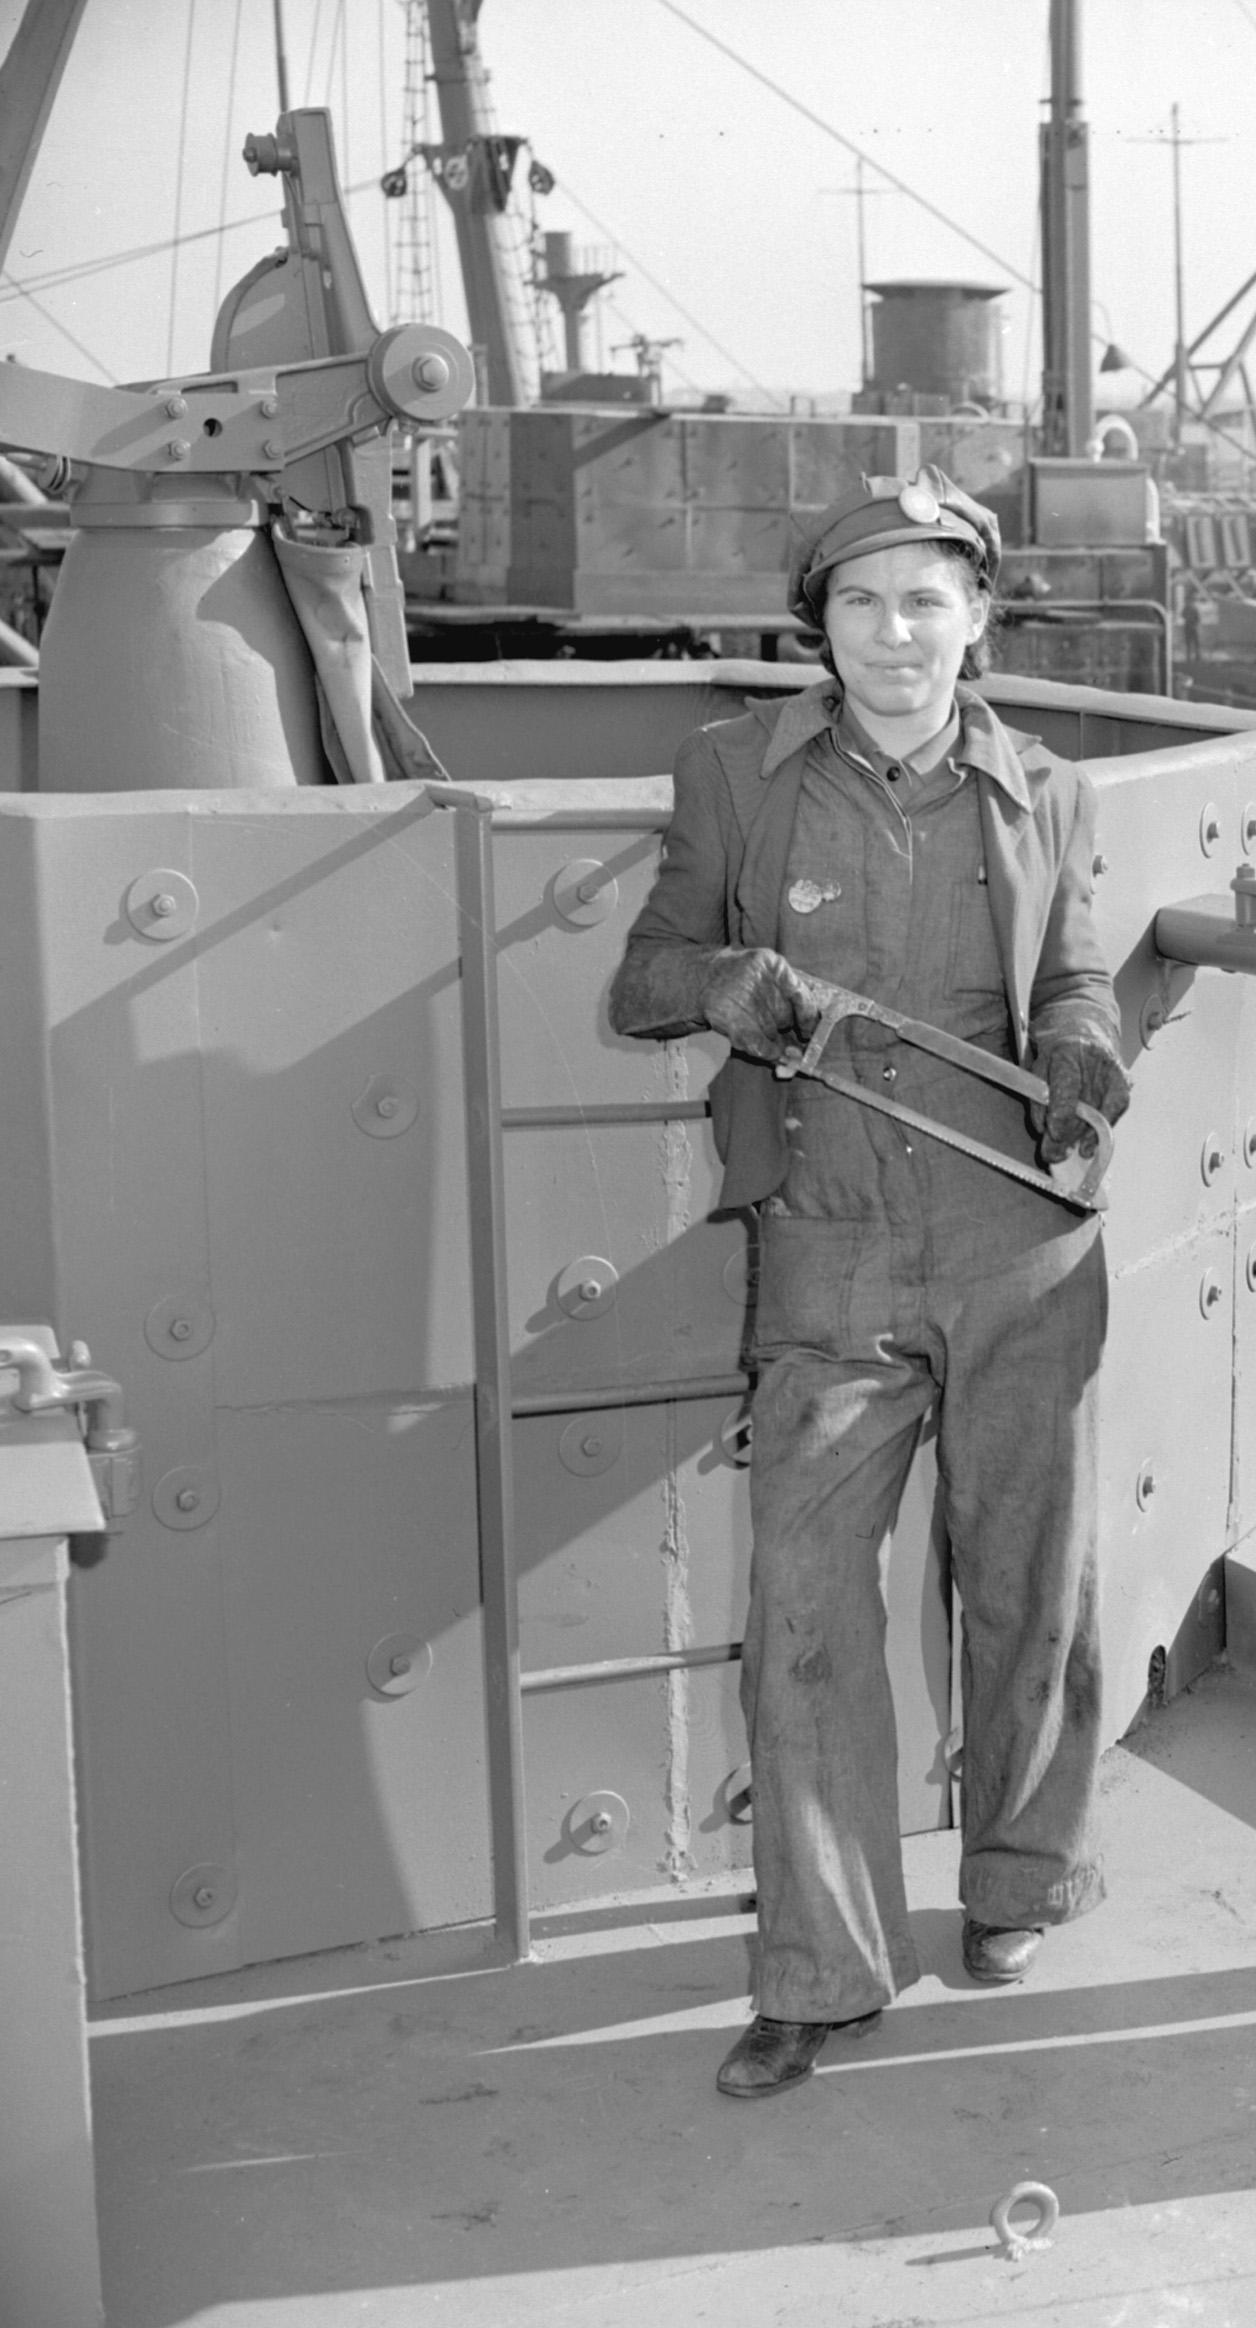 CVA-CVA 586-1130-LOCKIERENNIE-1943-NIS.JPG_A07551_HR crop